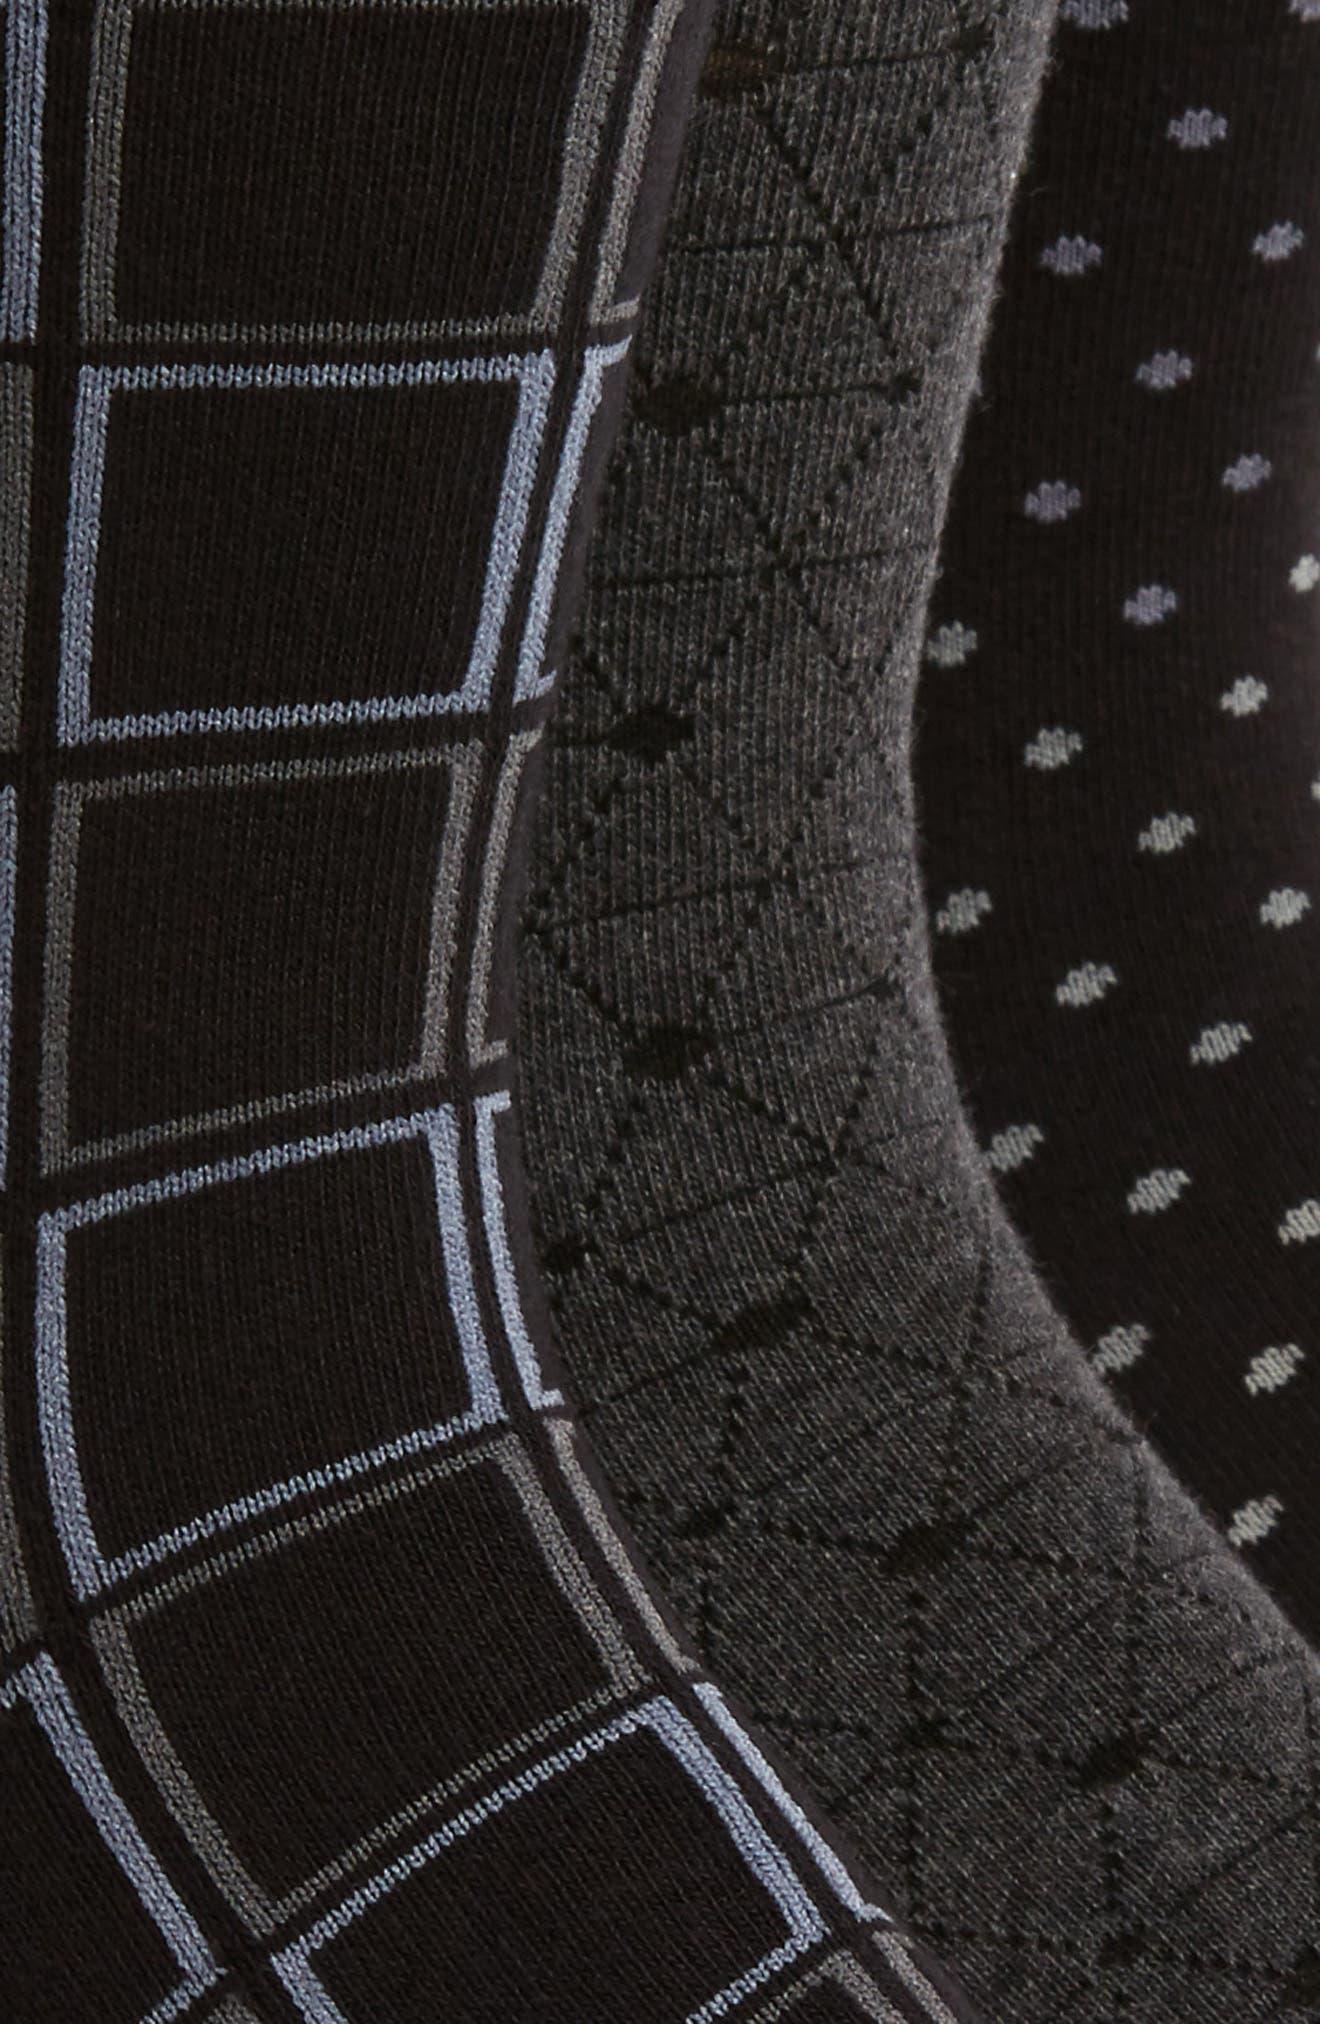 3-Pack Mixed Pattern Socks,                             Alternate thumbnail 2, color,                             Black/ Charcoal